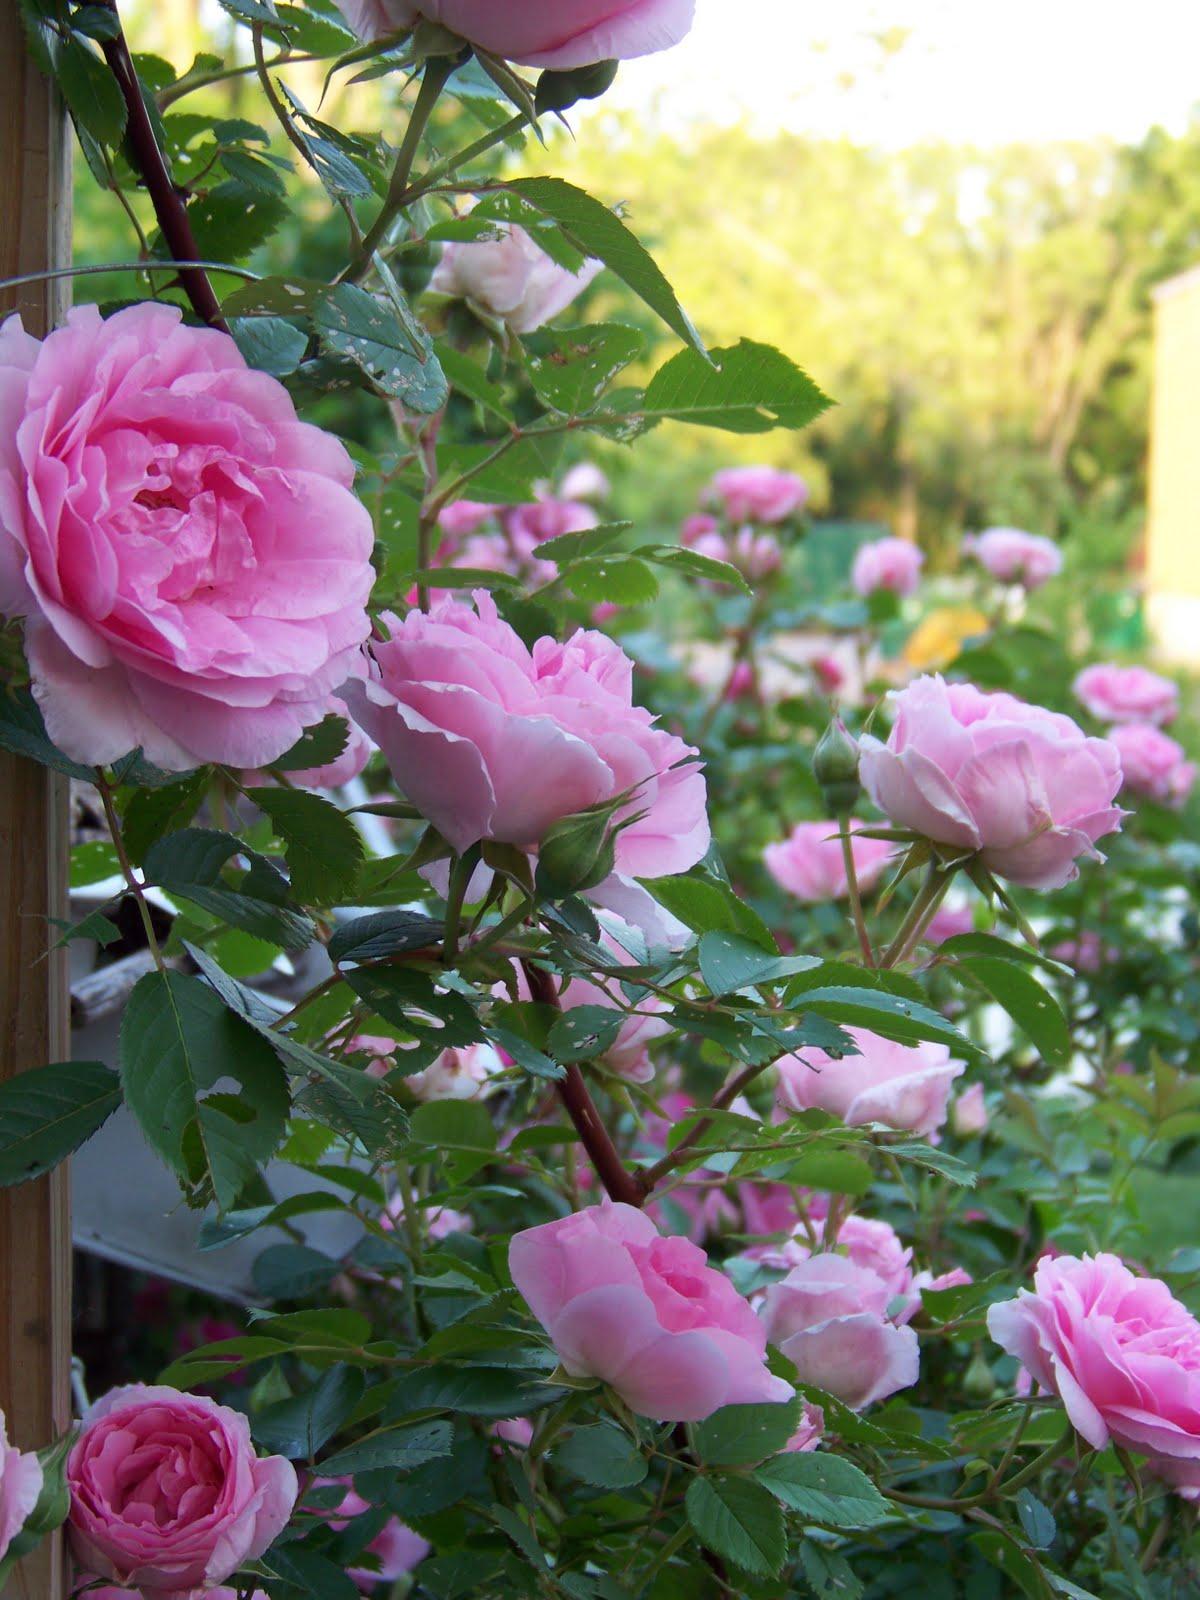 Roses In Garden: I Love My Garden: Ah, Roses